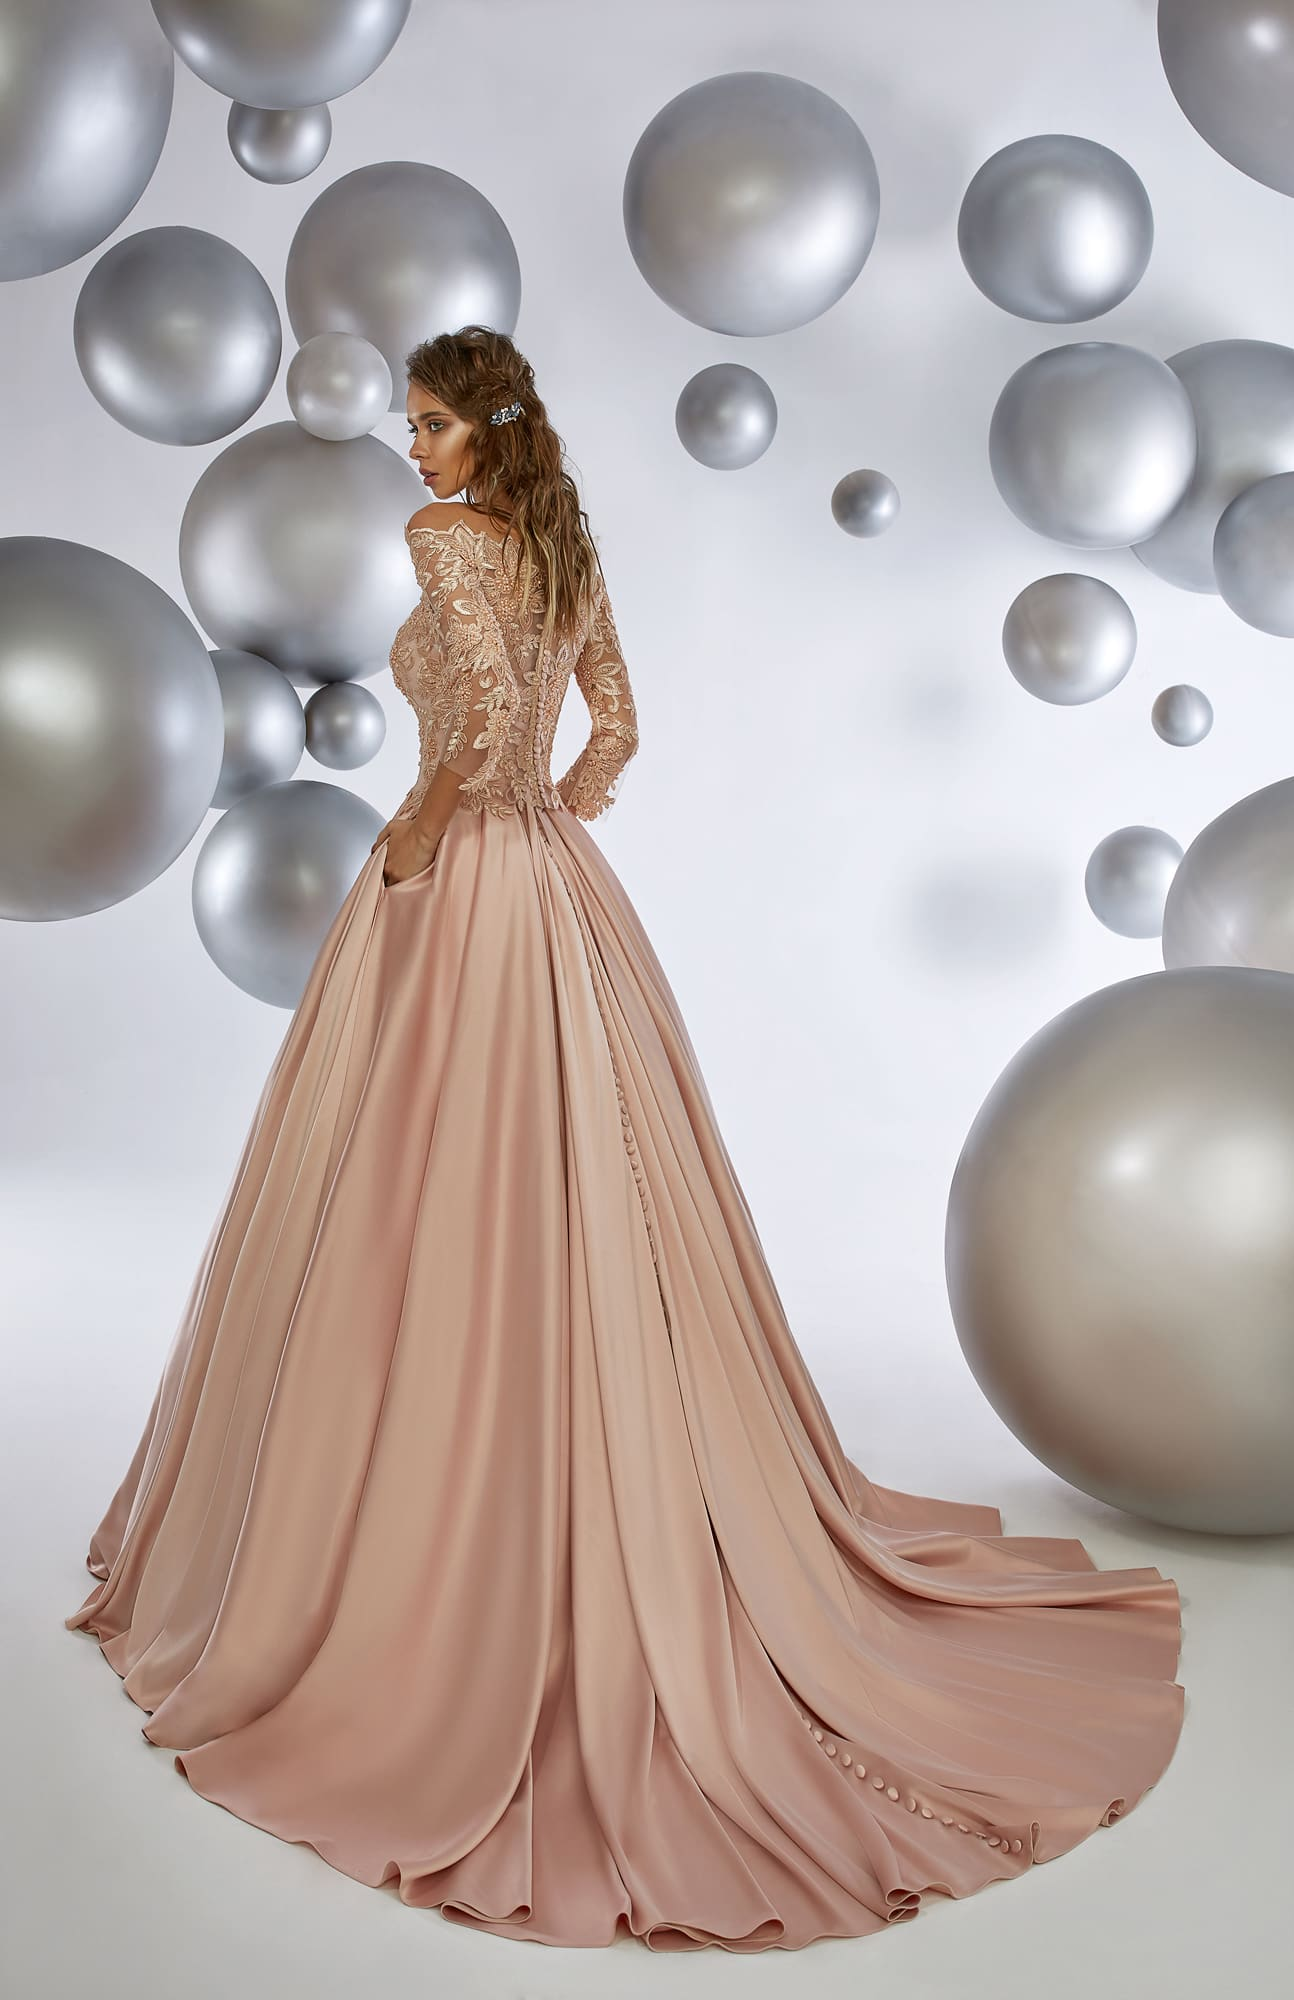 40141bfb5b01abc /shop/sinopia/ /shop/sweet_pink/. Аrmonia Colorful Dreams / Strawberry Ice.  Кремовое вечернее платье ...